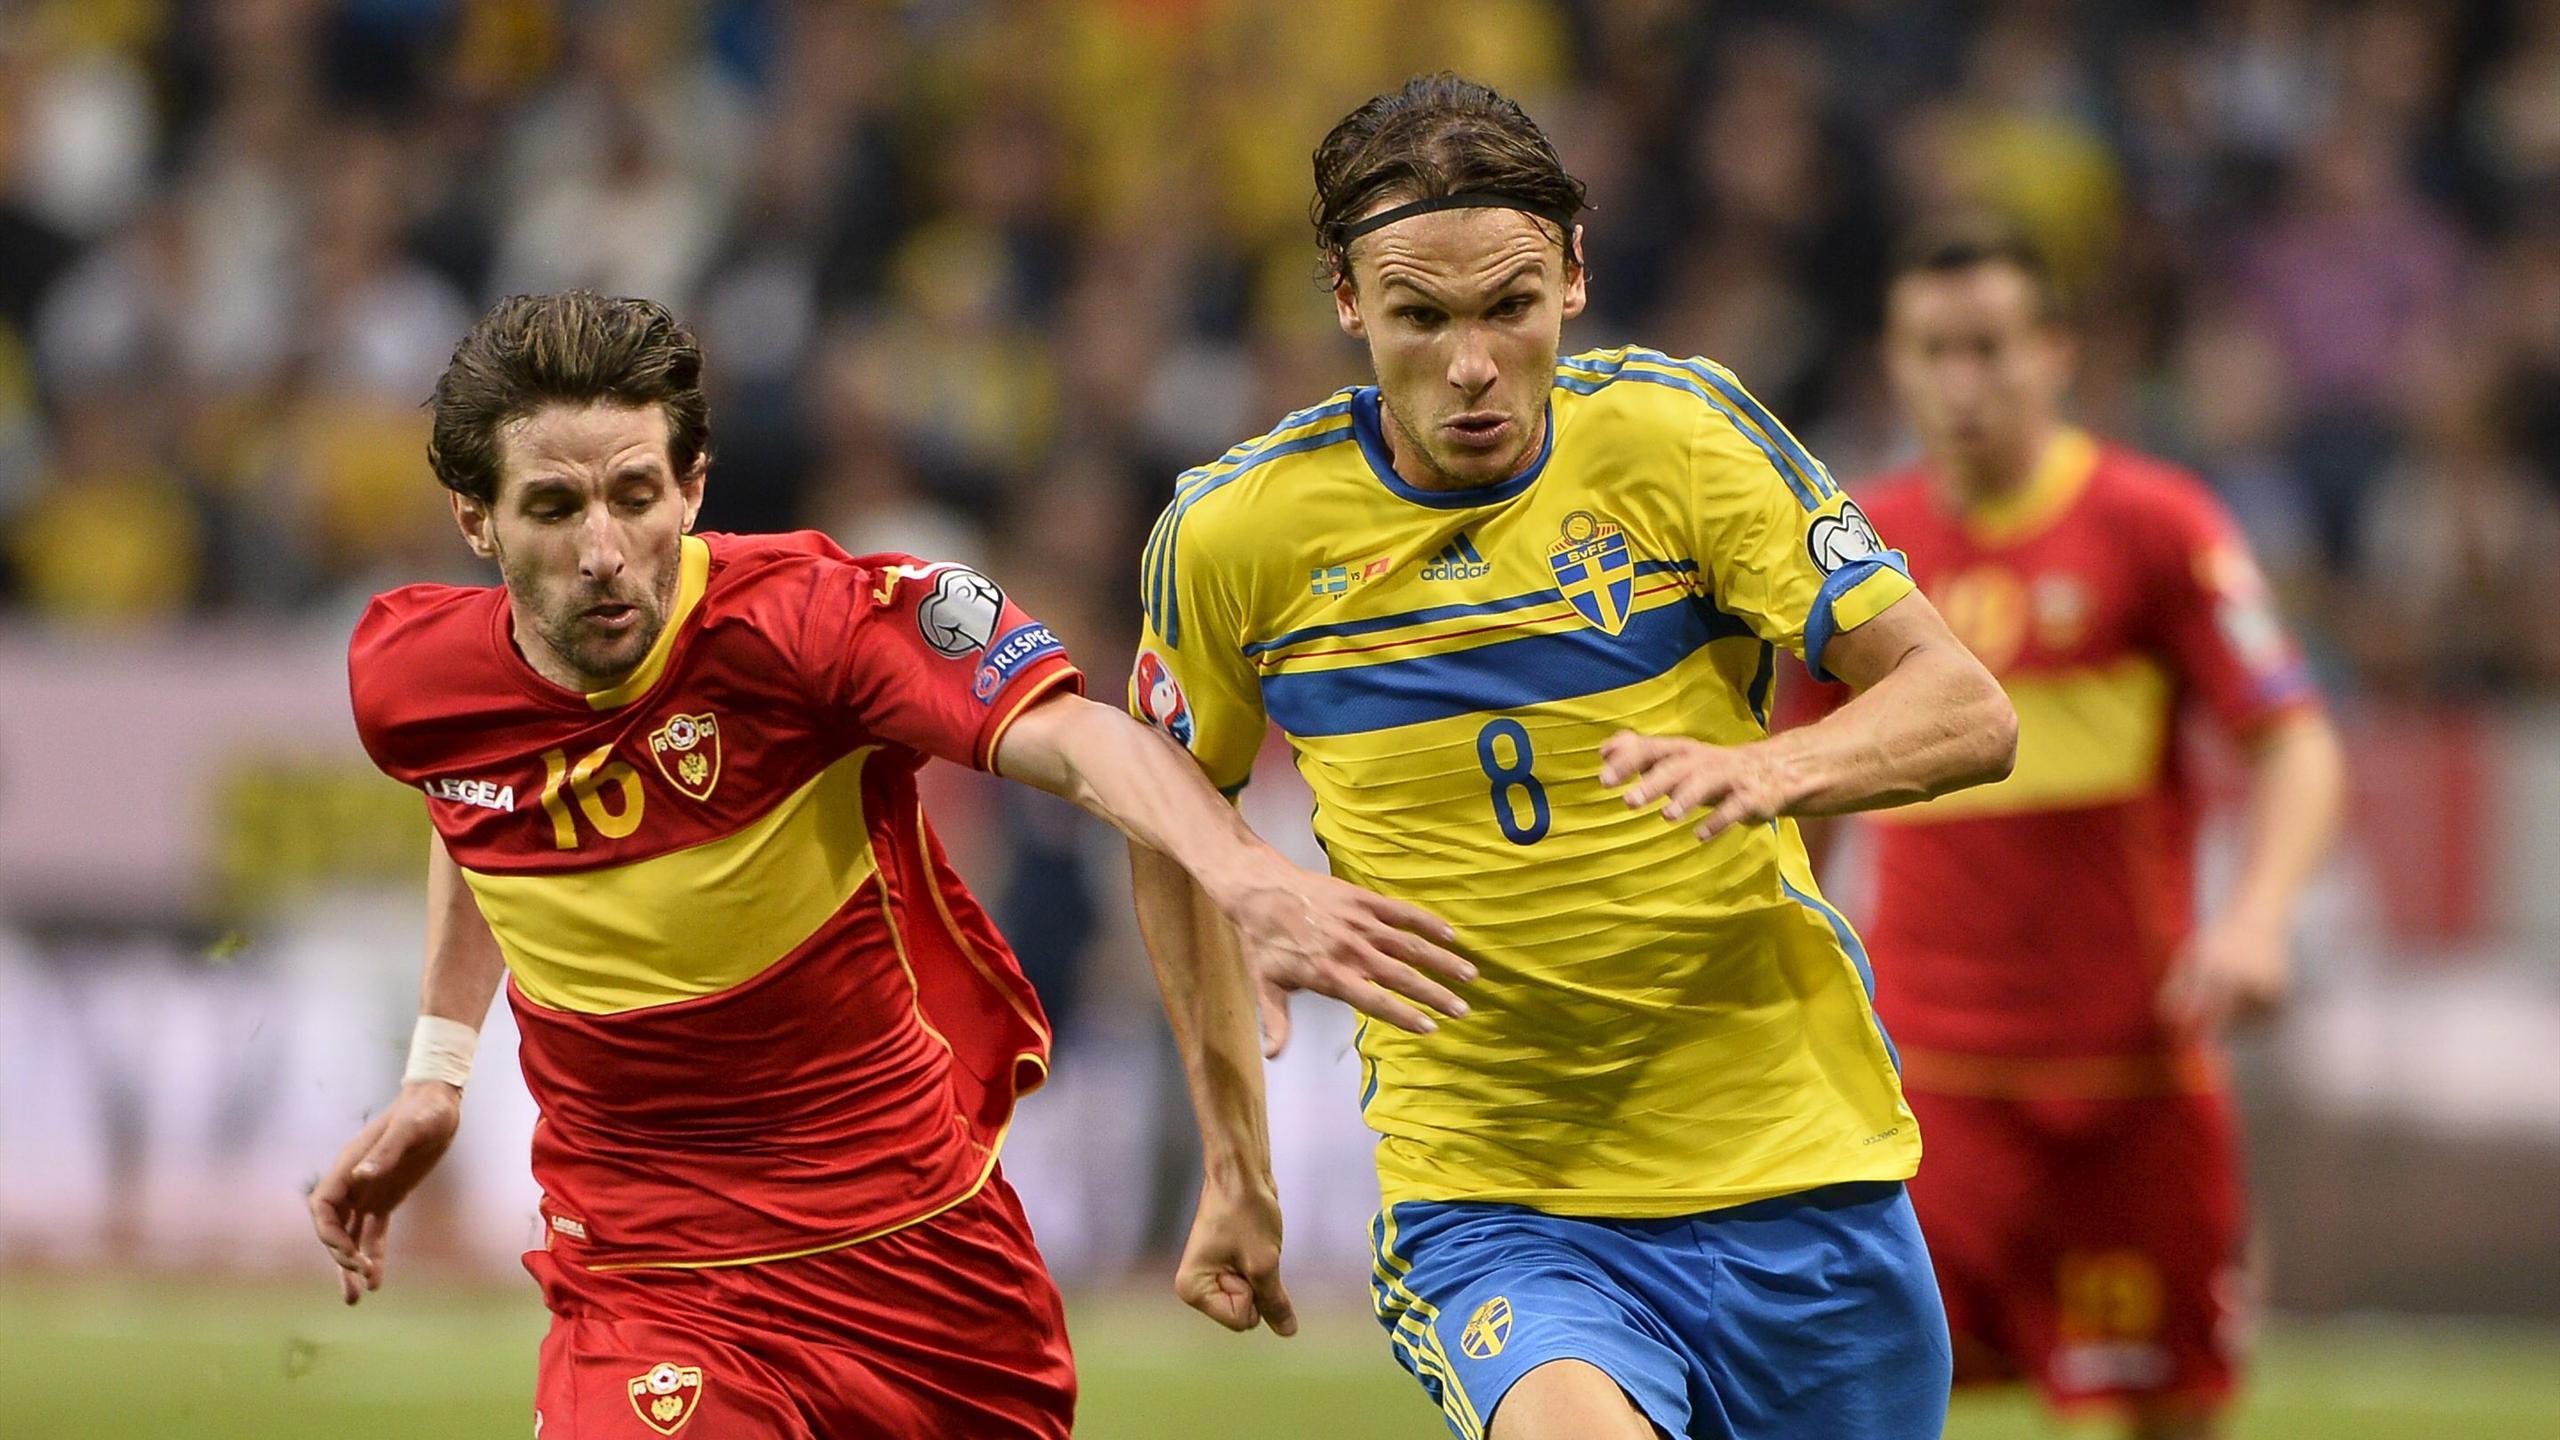 Montenegro's Mladen Kascelan, left, fights for the ball with Sweden's Albin Ekdal